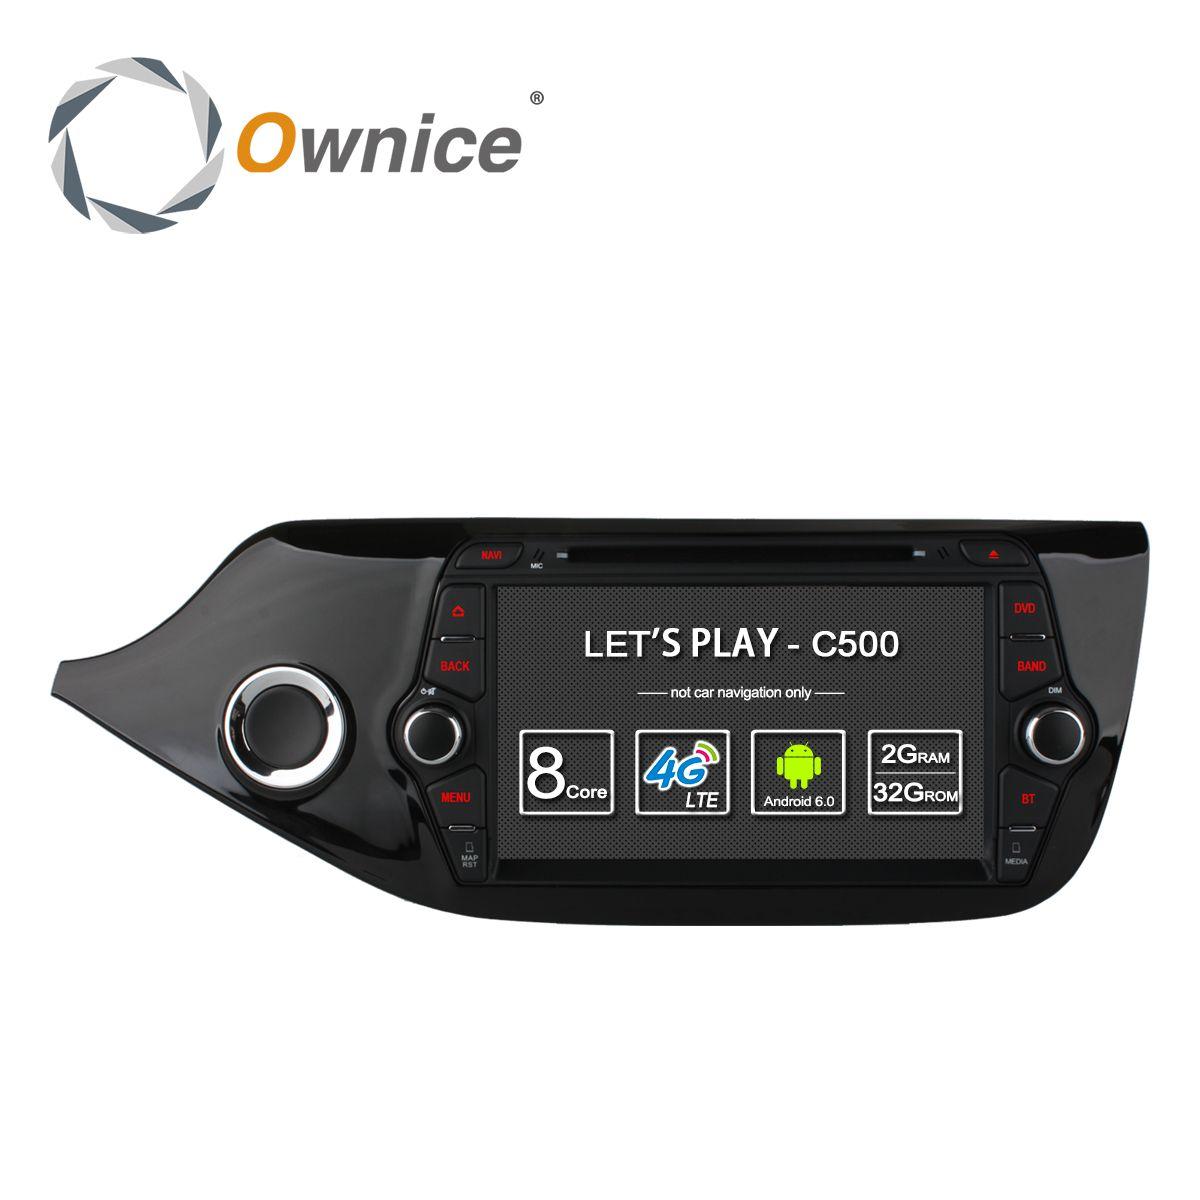 Ownice C500 4G SIM LTE Octa 8 Core  Android 6.0 For Kia CEED 2013-2015 Car DVD Player GPS Navi Radio WIFI 4G BT 2GB RAM 32G ROM